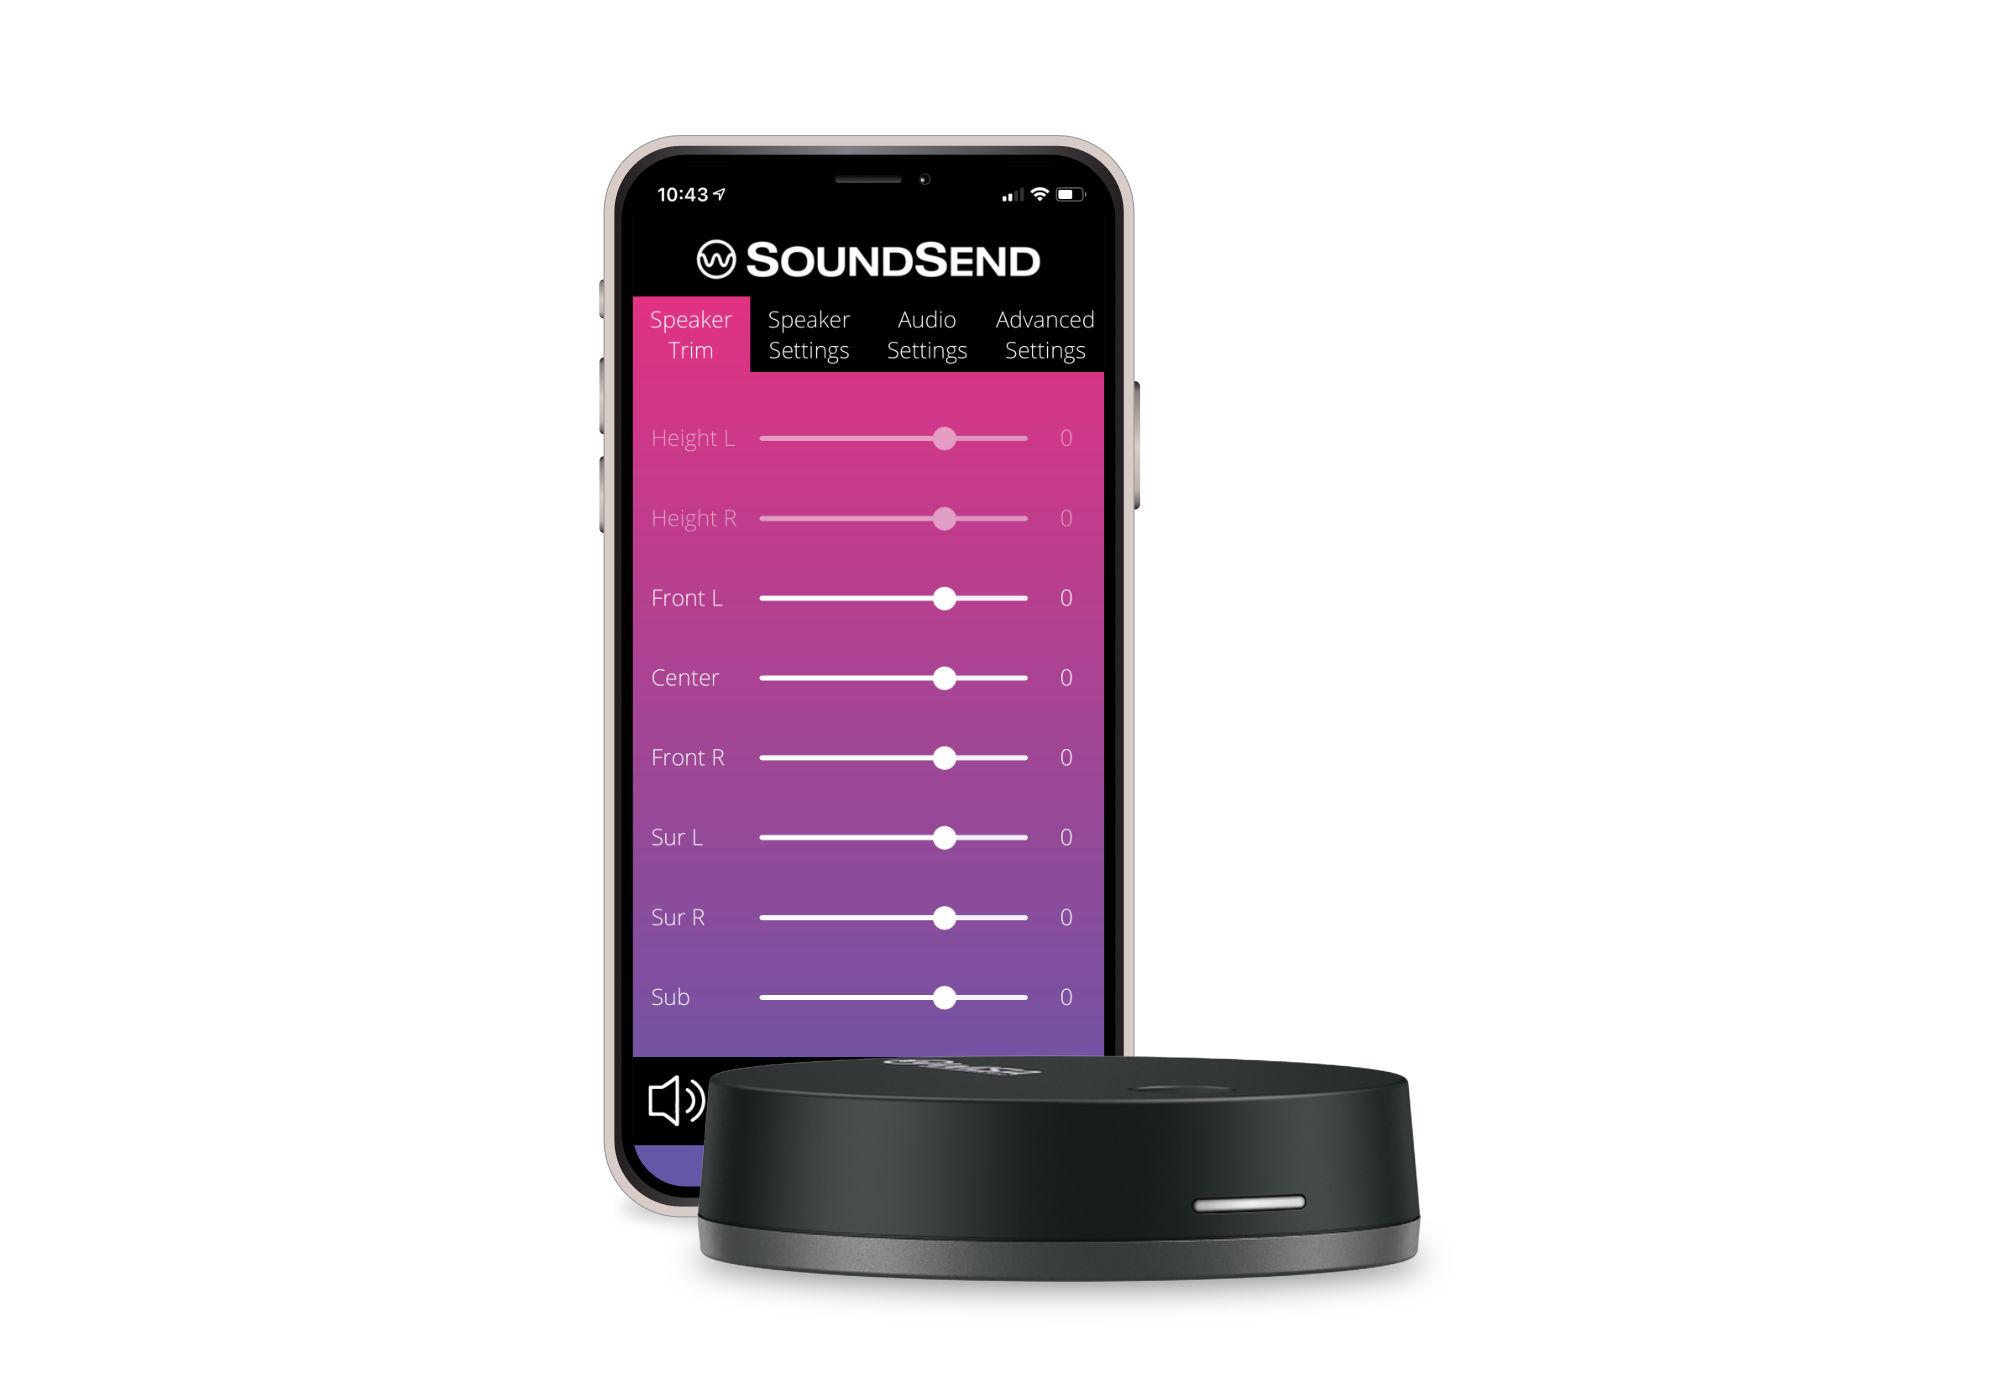 SoundSend App open on a phone